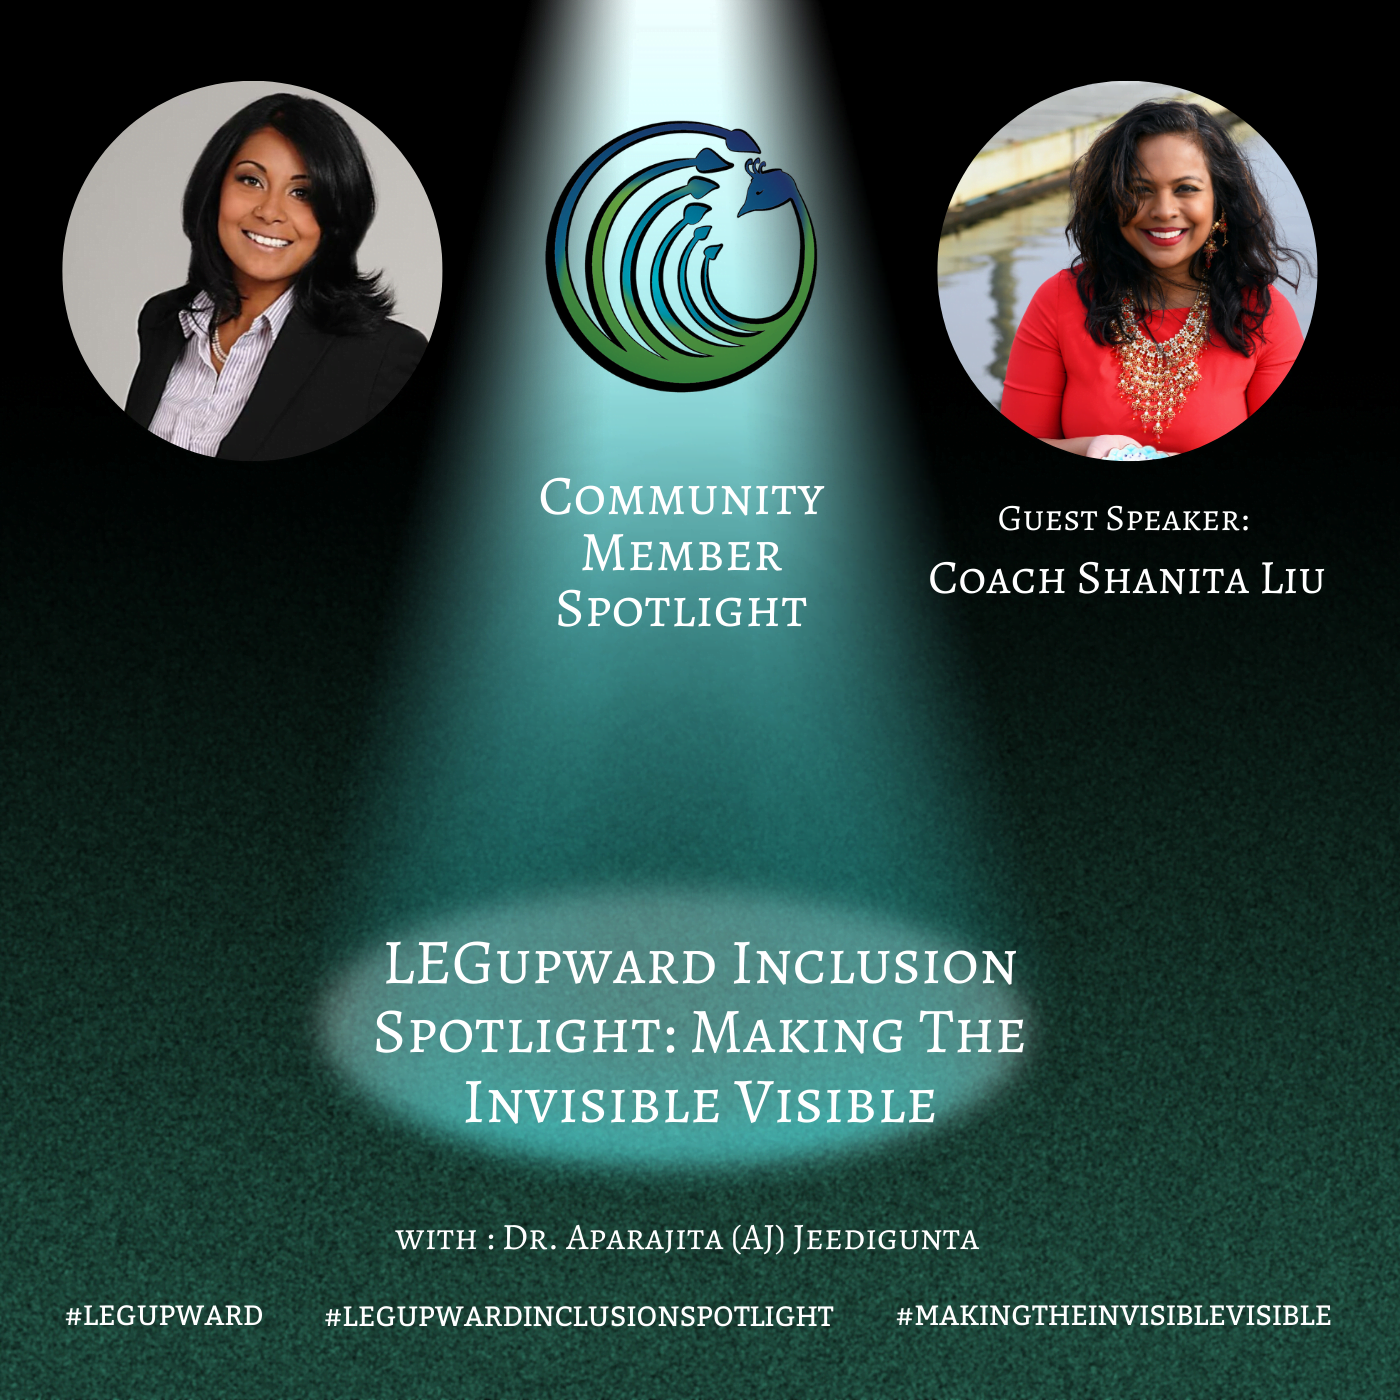 LEGupward Inclusion Spotlight